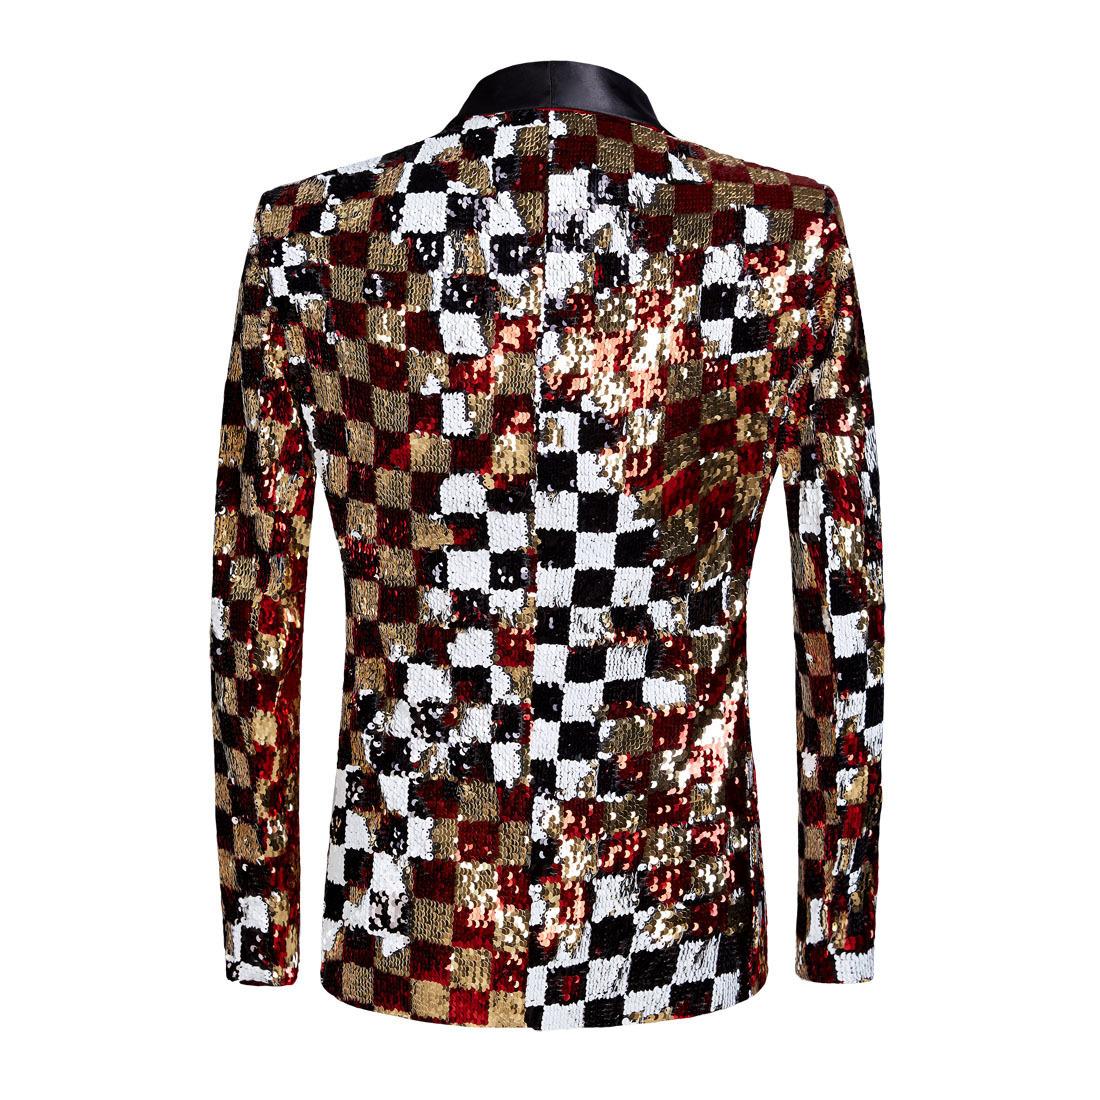 Pyjtrl Brand New Men Double-sided Colorful Plaid Red Gold White Black Sequins Blazer Design Dj Singer Suit Jacket Fashion Outfit